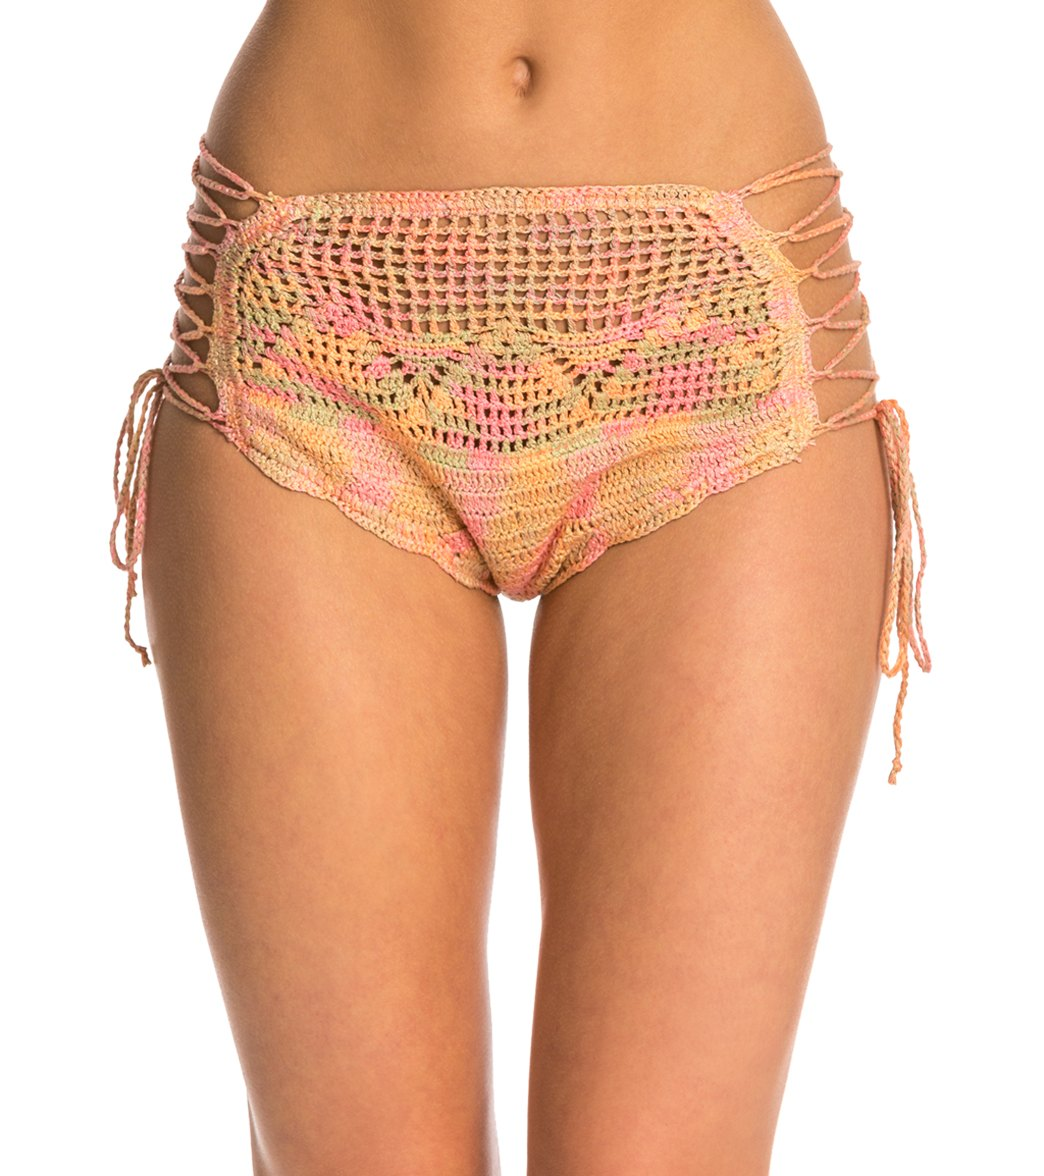 bb9c0e8bfb ... Love Birds Crochet High Waist Bikini Bottom. Play Video. MODEL  MEASUREMENTS